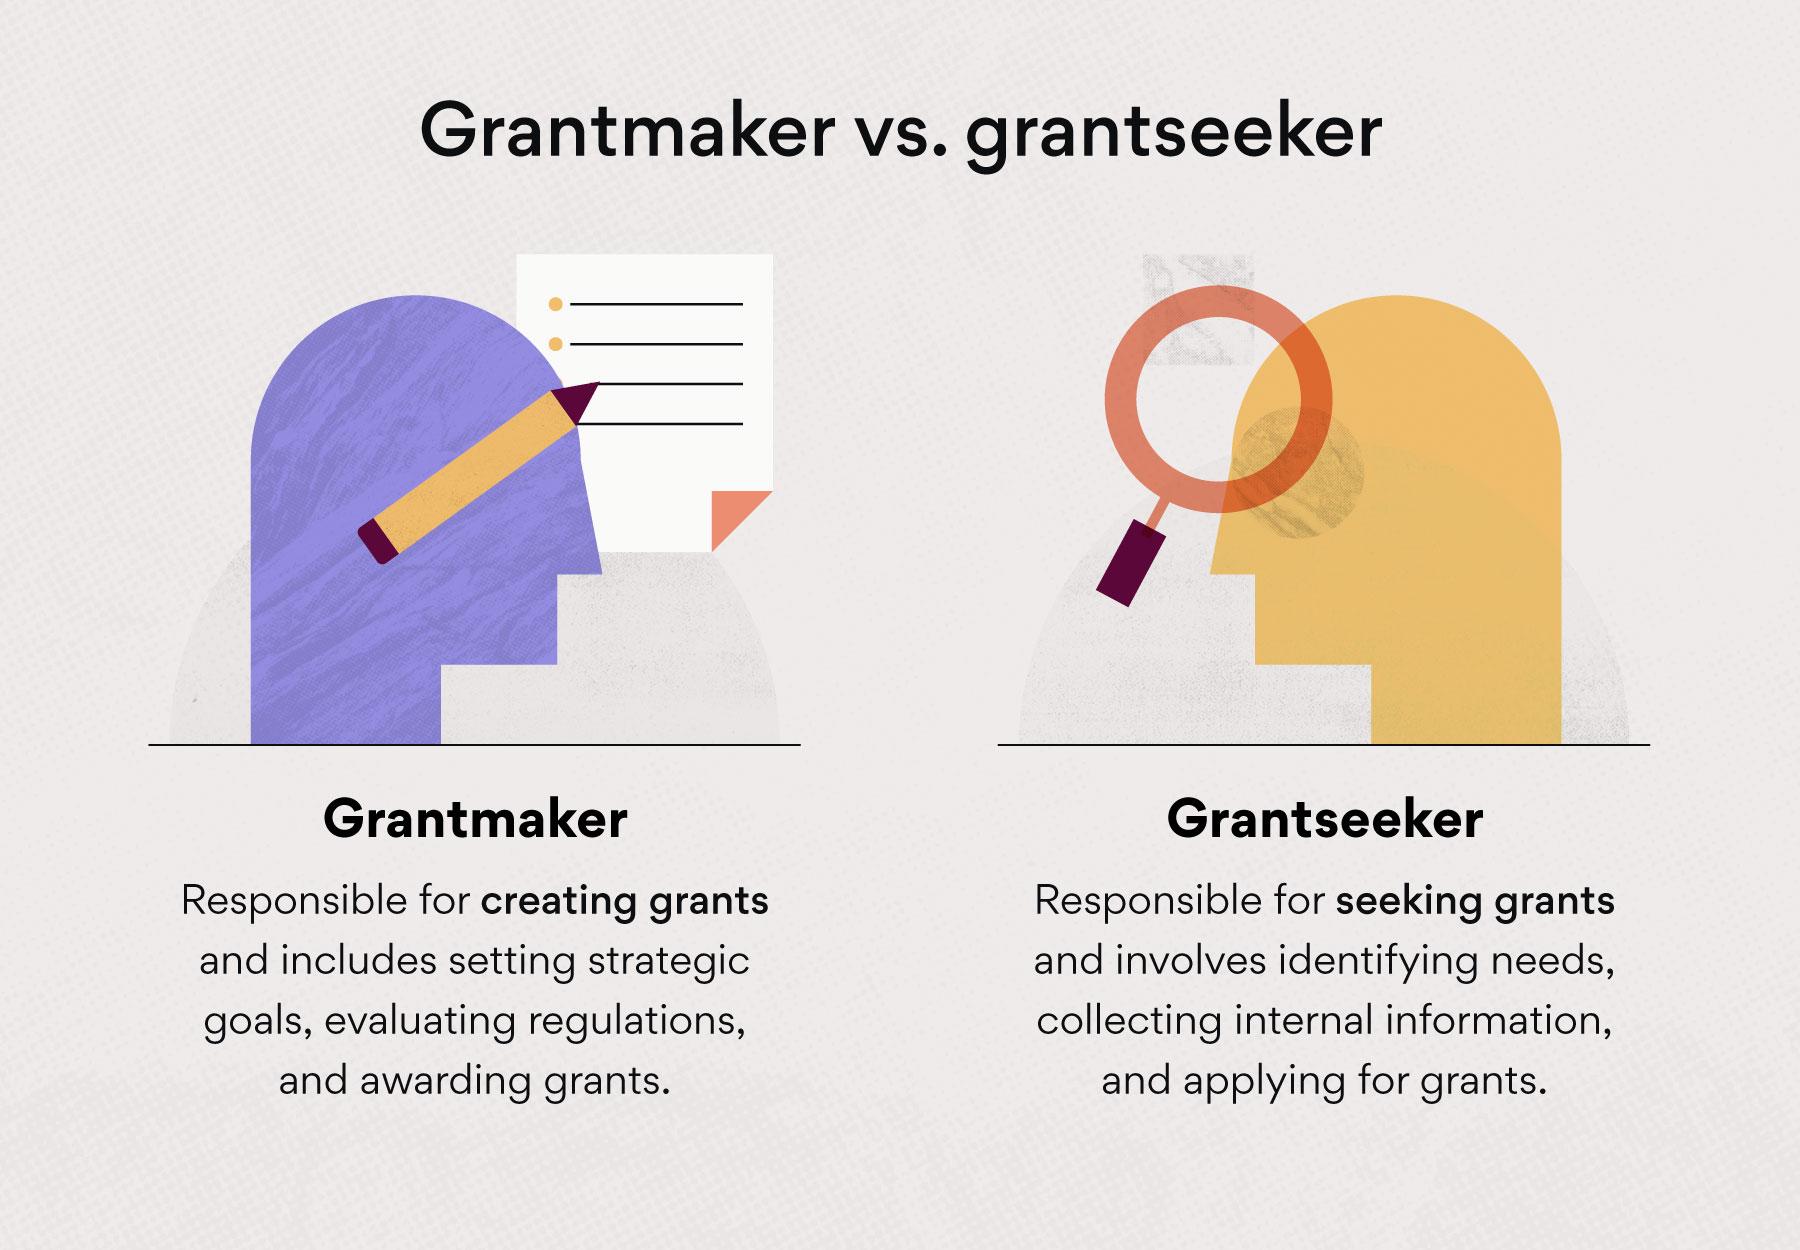 Grantmaker vs. grantseeker